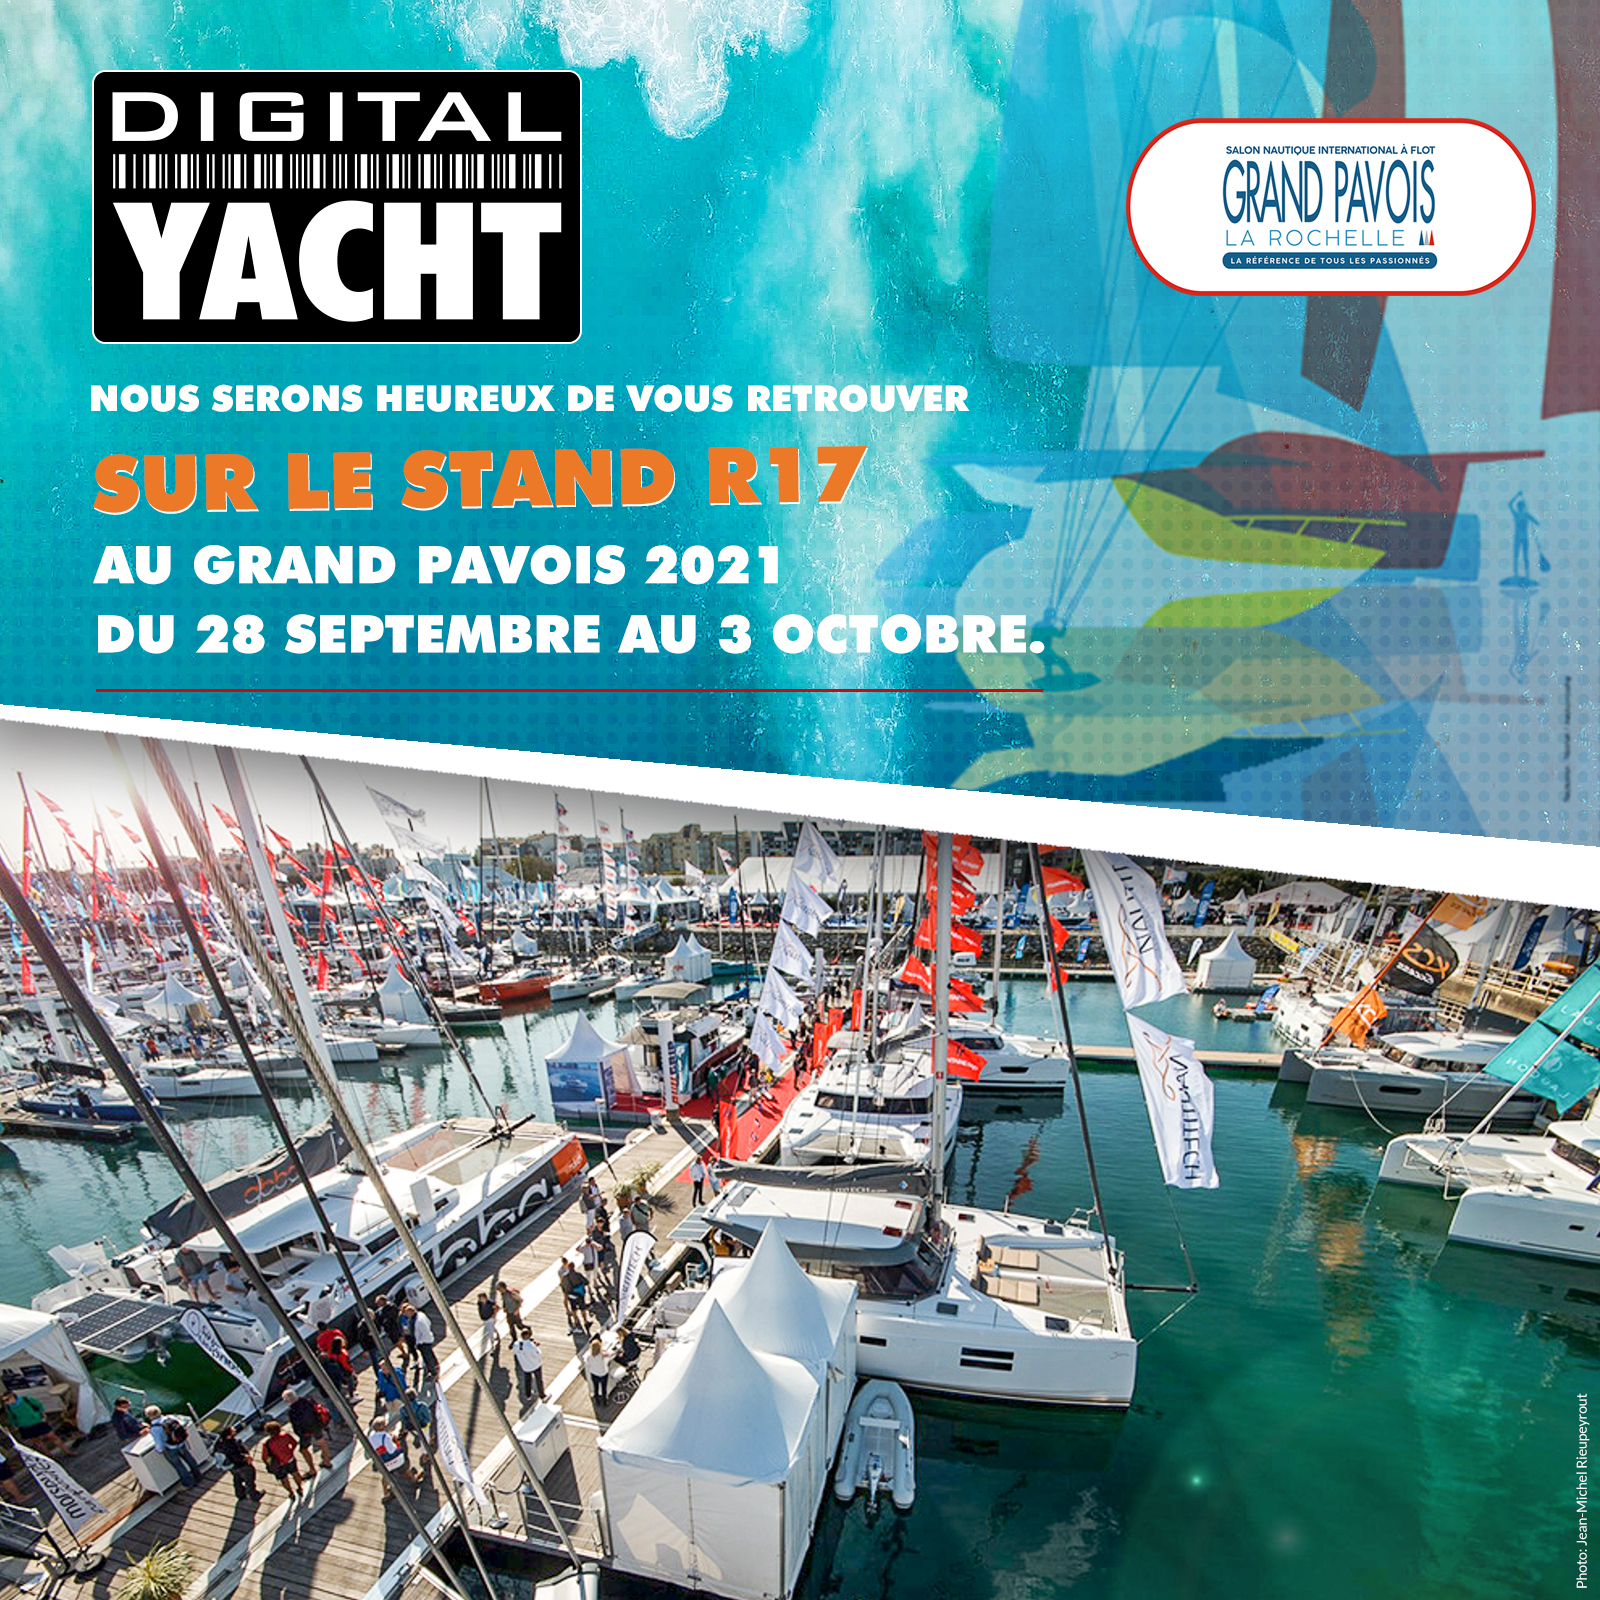 digital yacht grand pavois